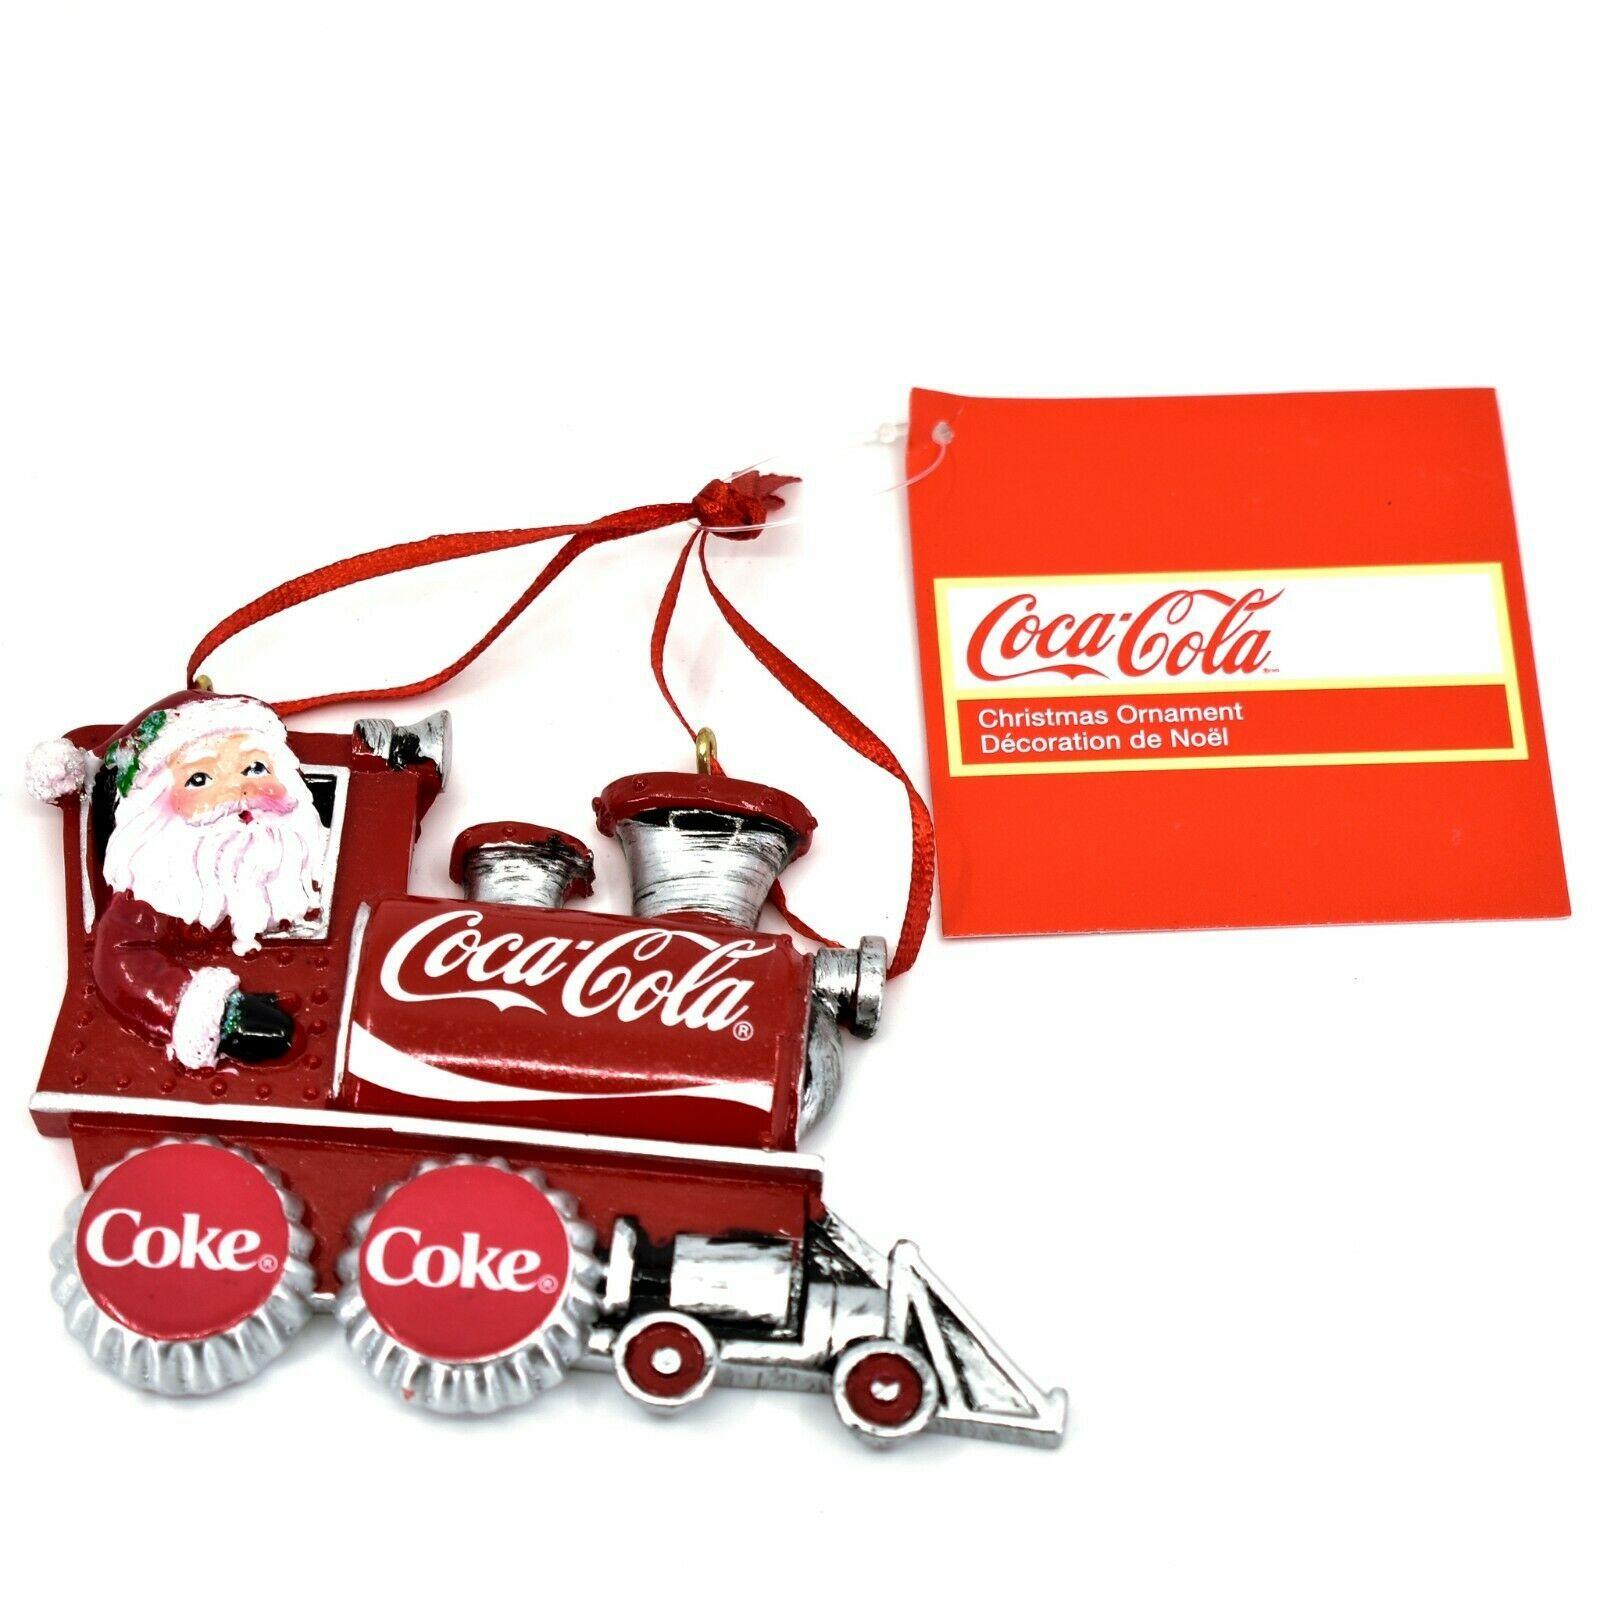 Kurt S. Adler Santa Claus Driving Coca-Cola Train Christmas Ornament CC2183